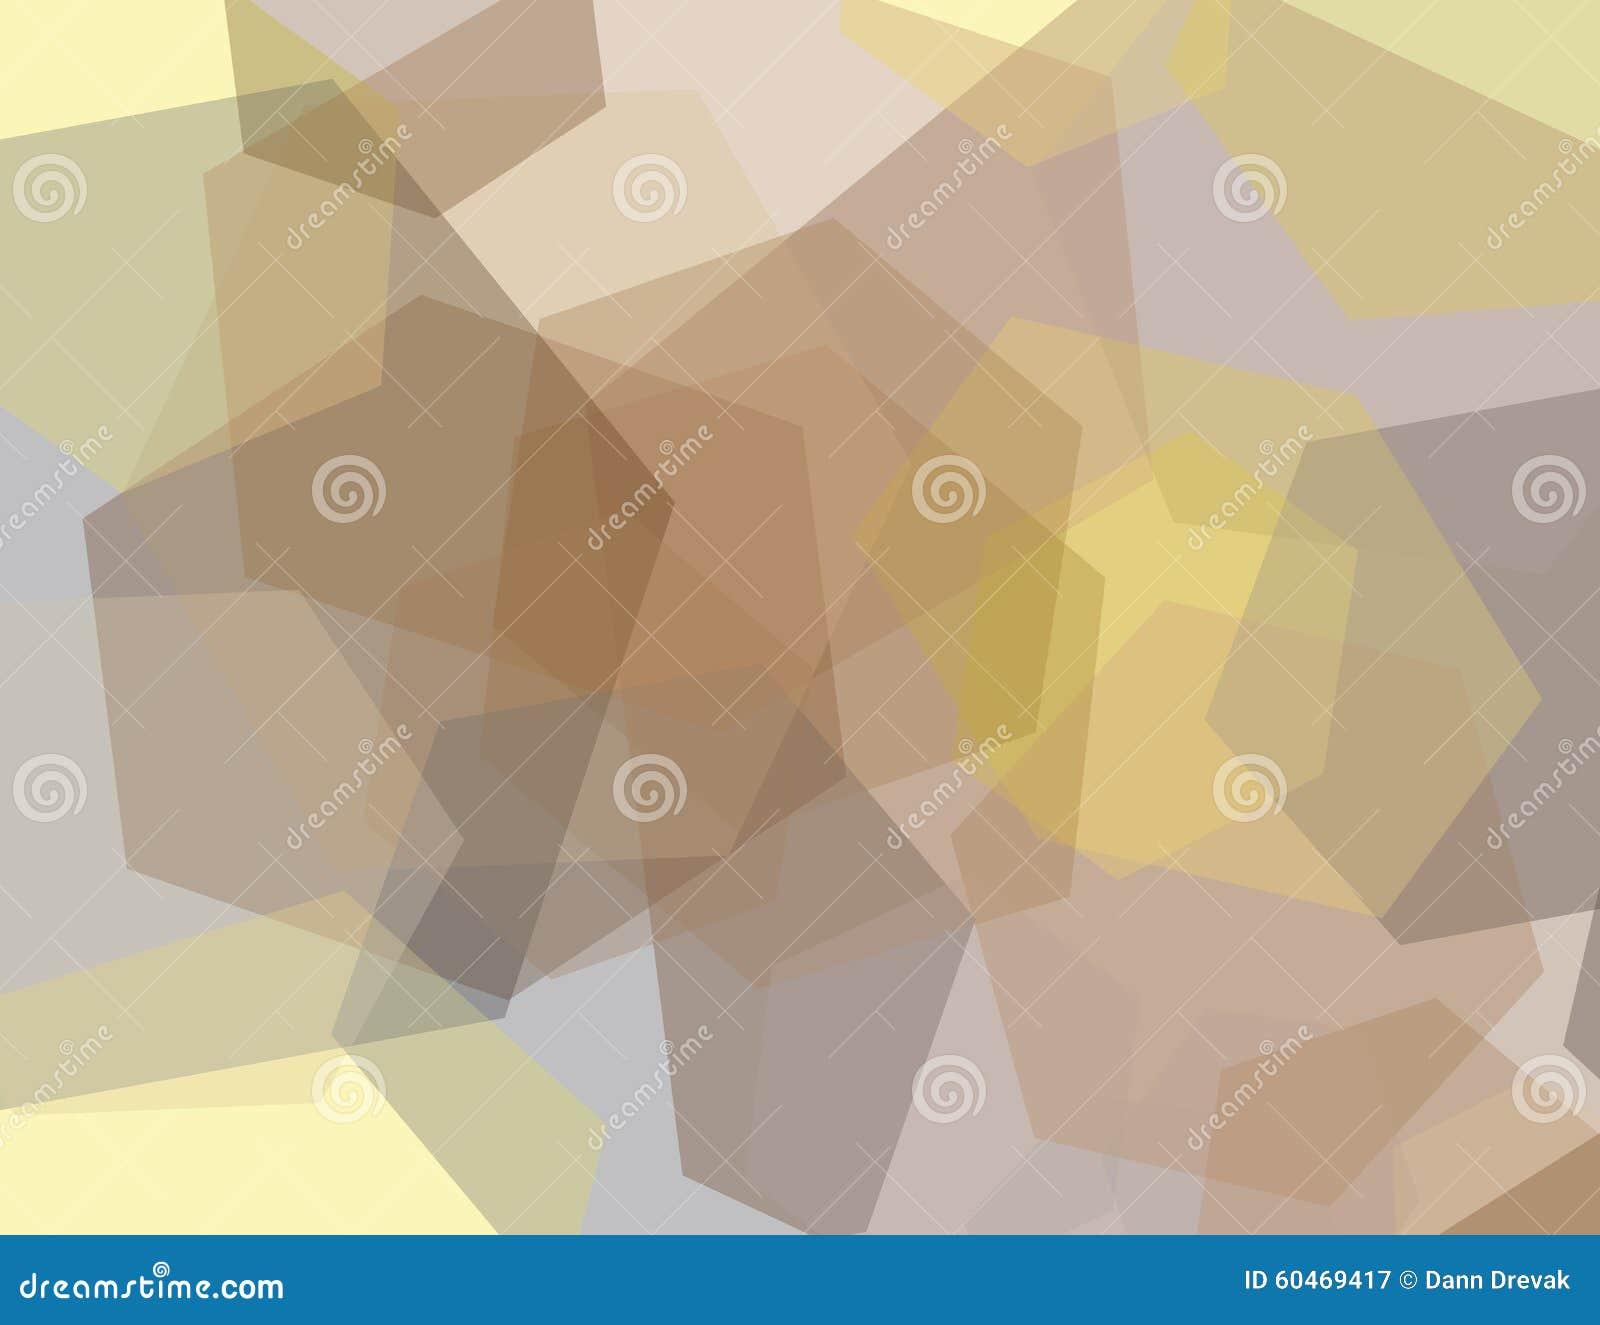 Hexagon Geometric Pattern